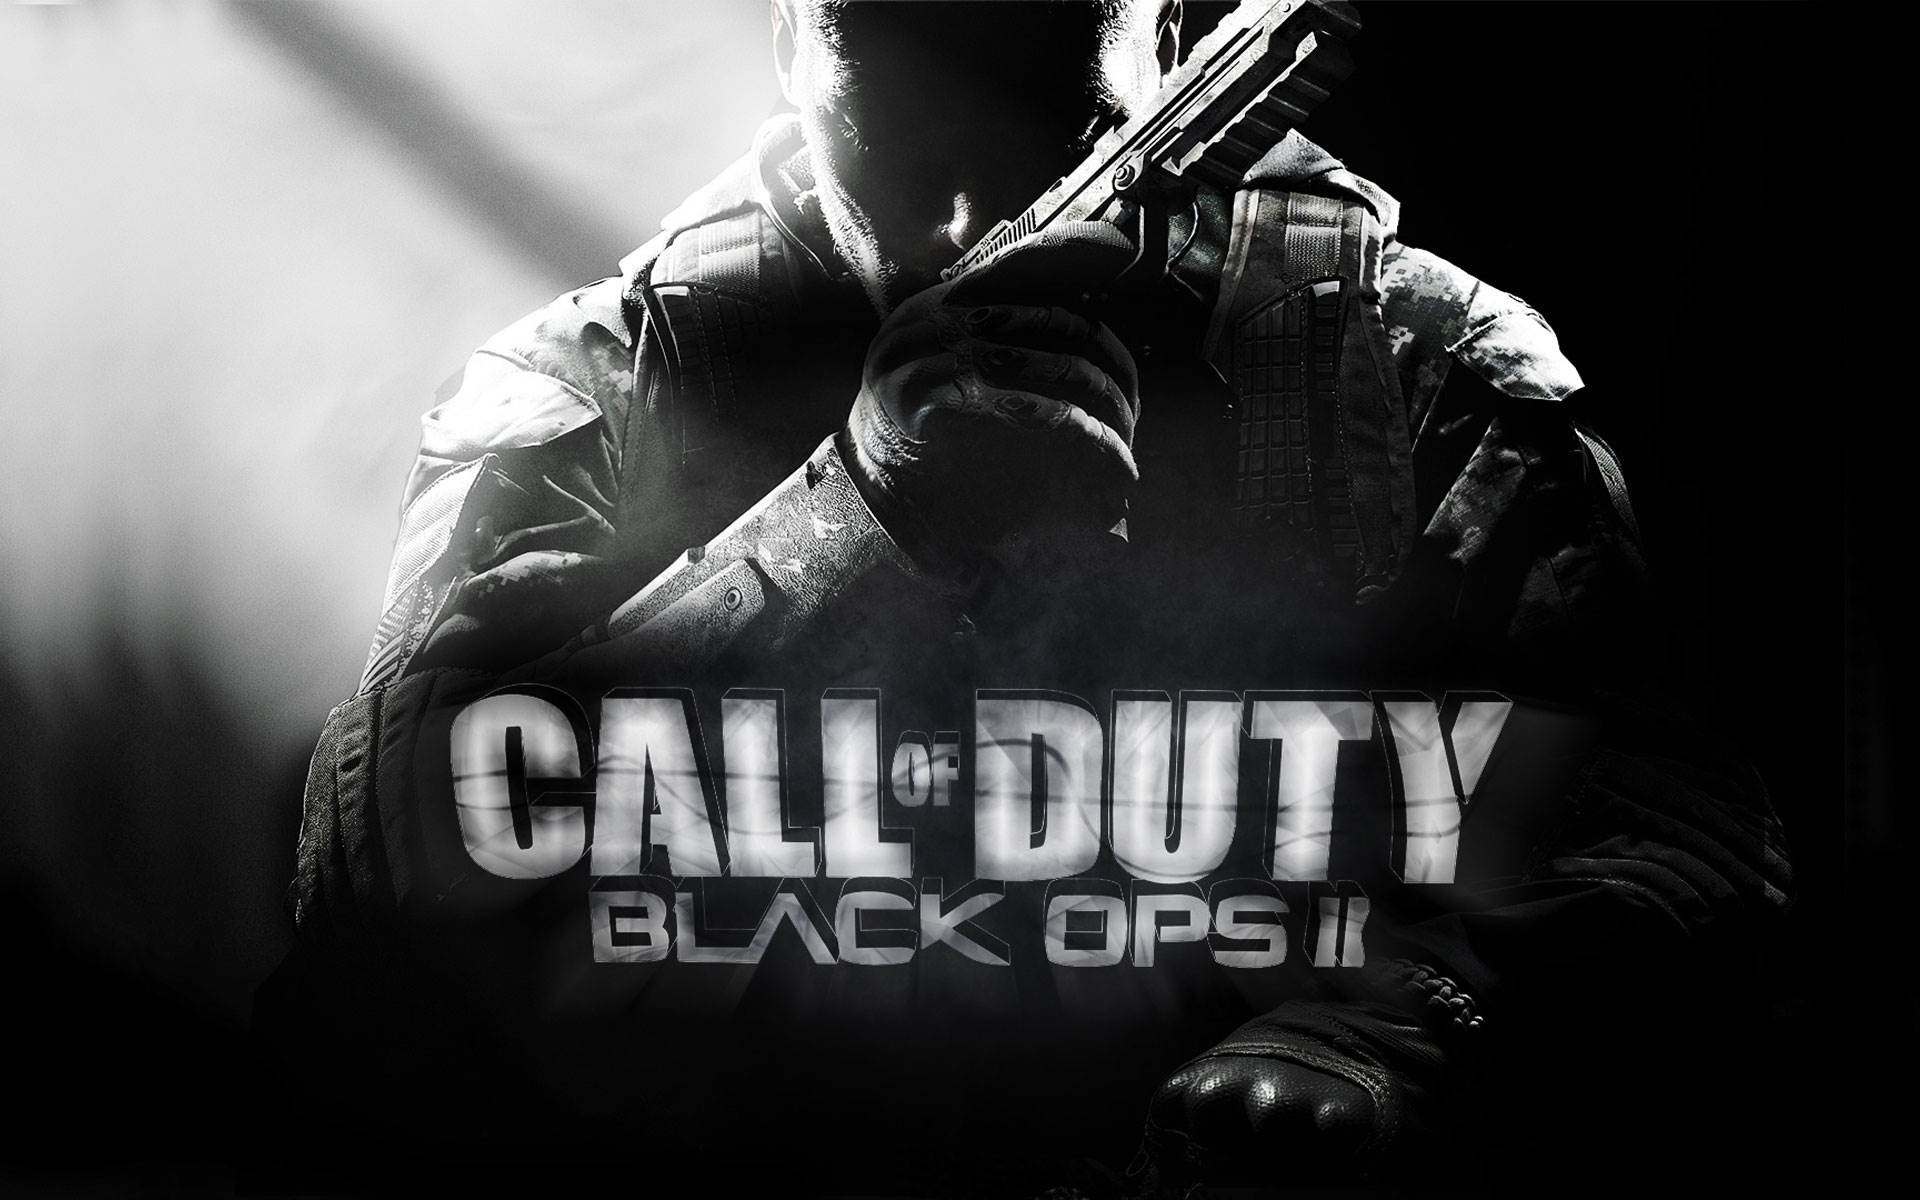 Call Of Duty Black Ops Zombie wallpaper u wallpaper free download 1191×670  Call